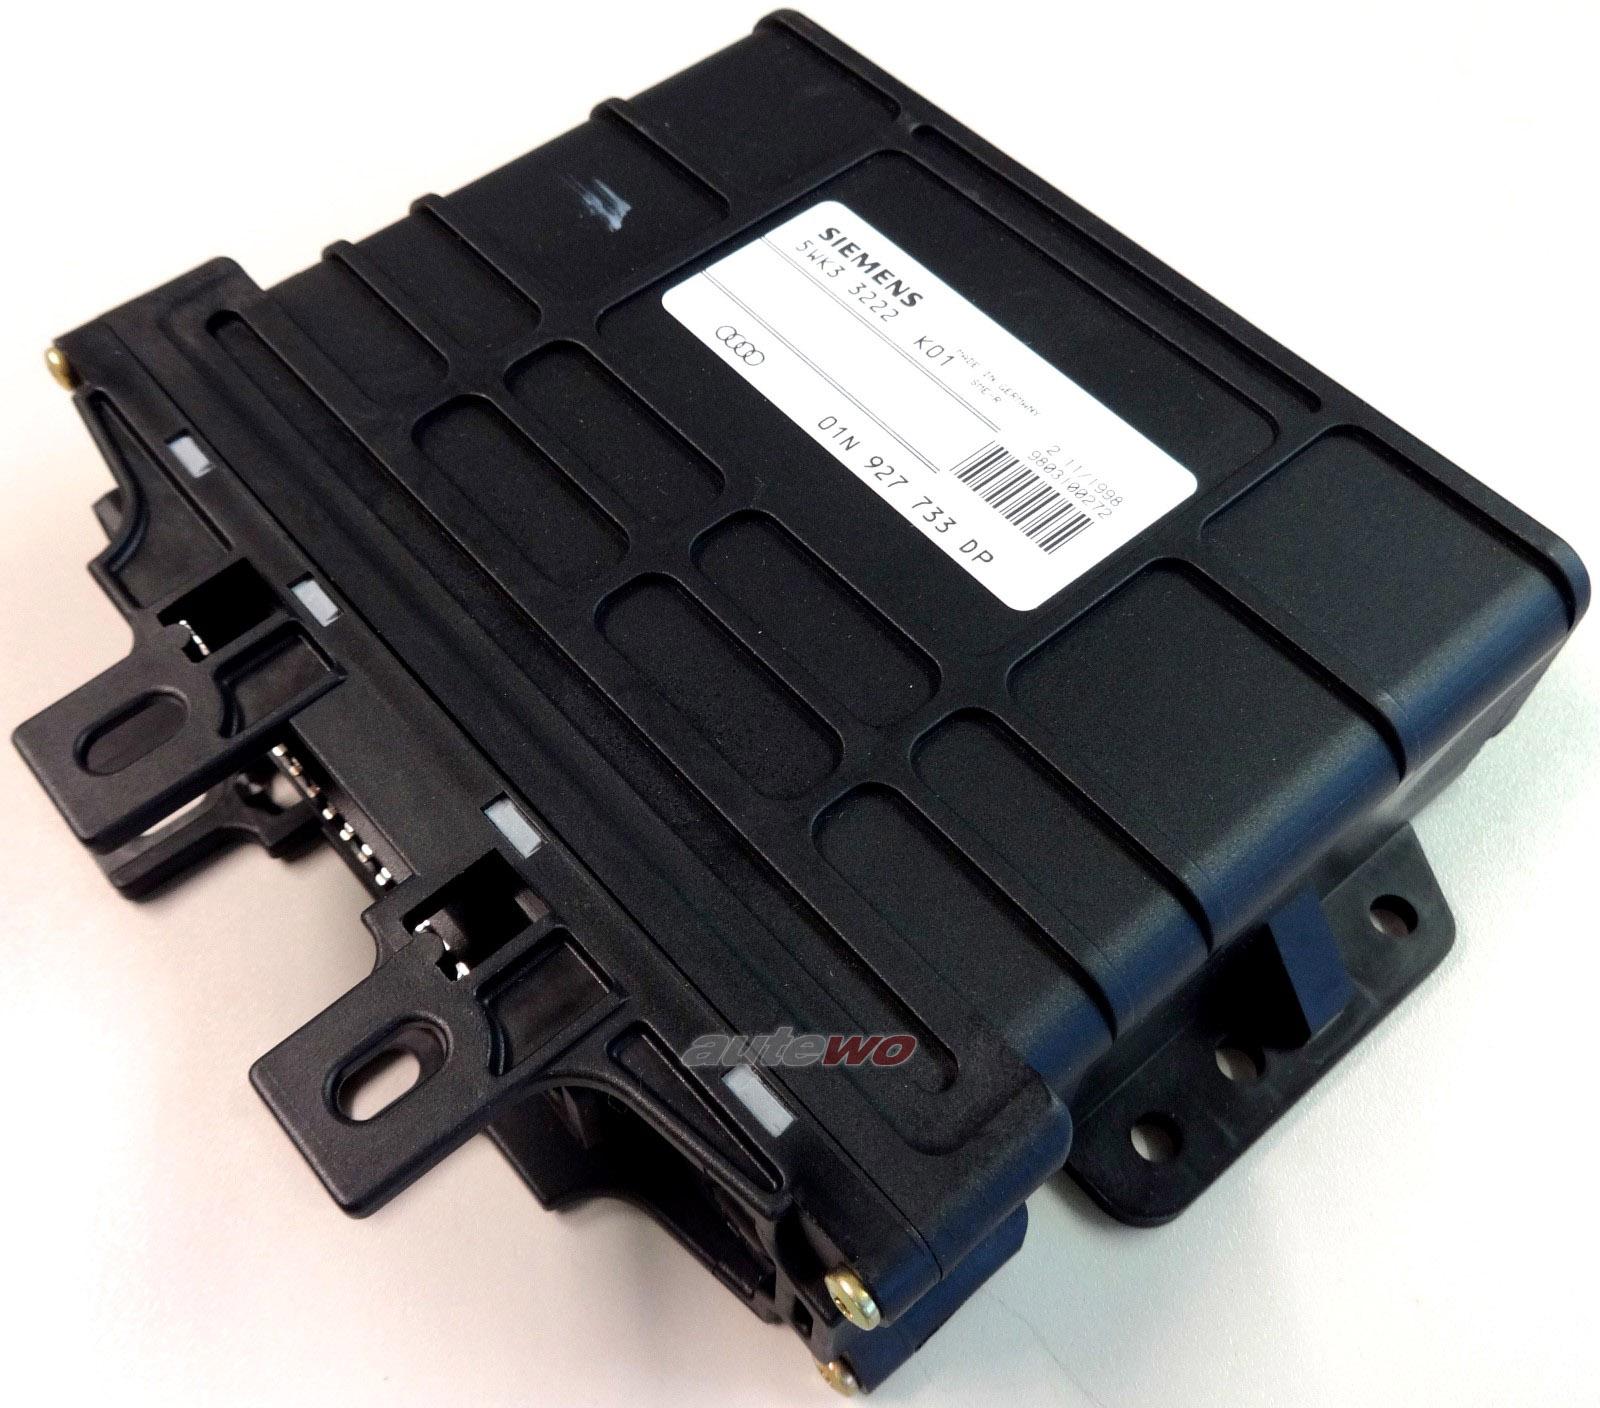 #01N927733EJ/DG 01N927733DP 5WK33222 Audi A4 B5 1.9l TDI Getriebesteuerung